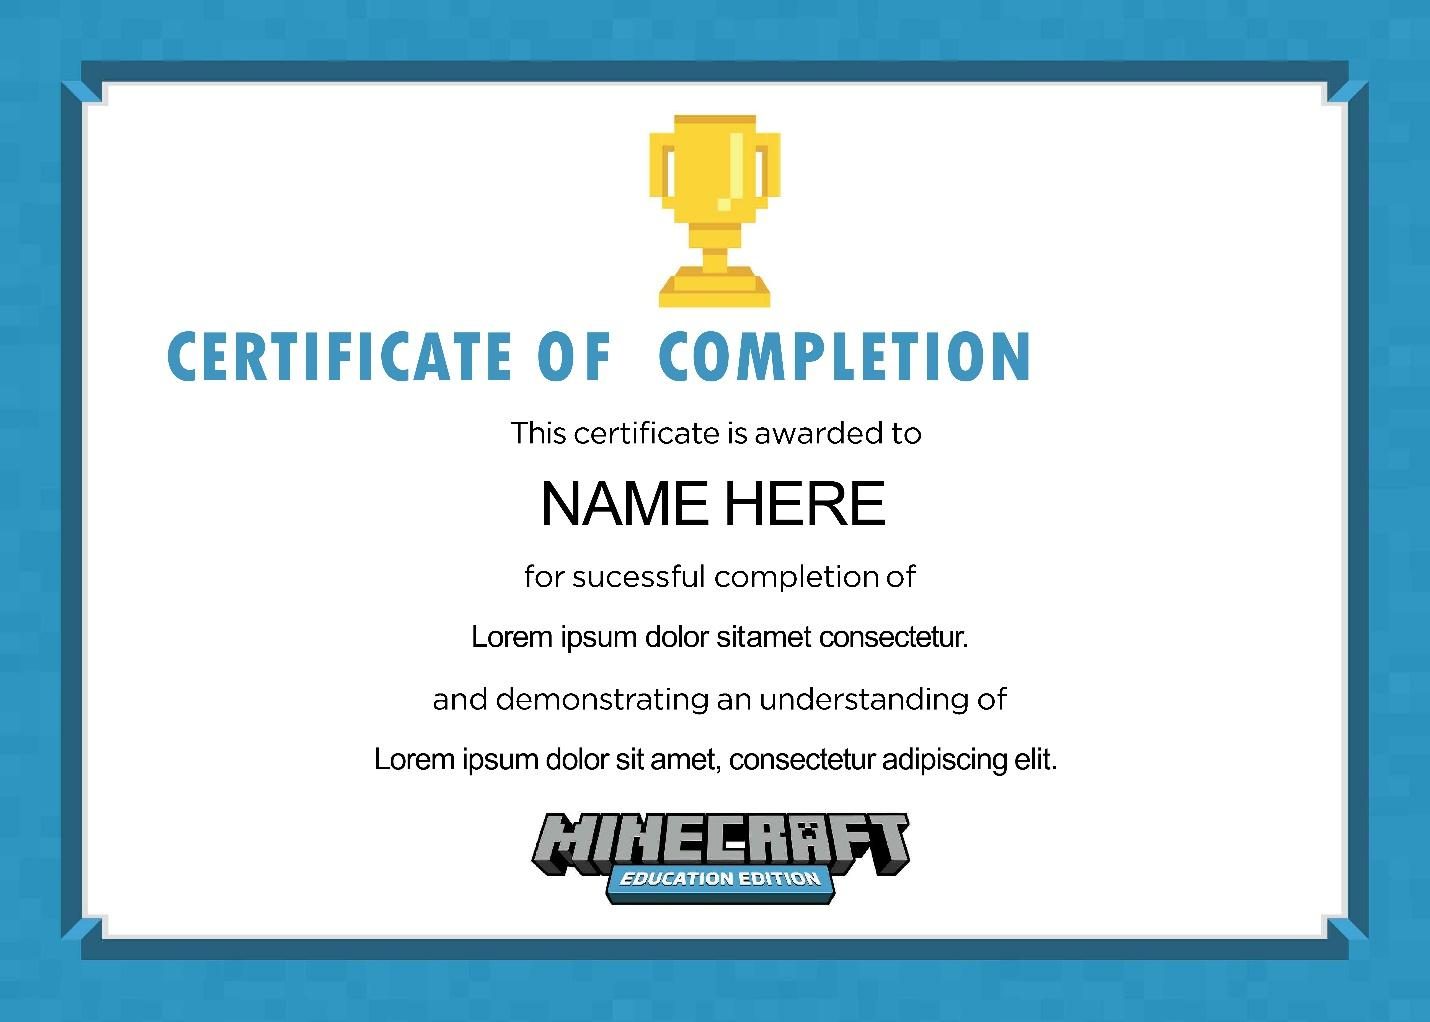 D:\Downloads\EducationEdition_Certificate_Final.jpg